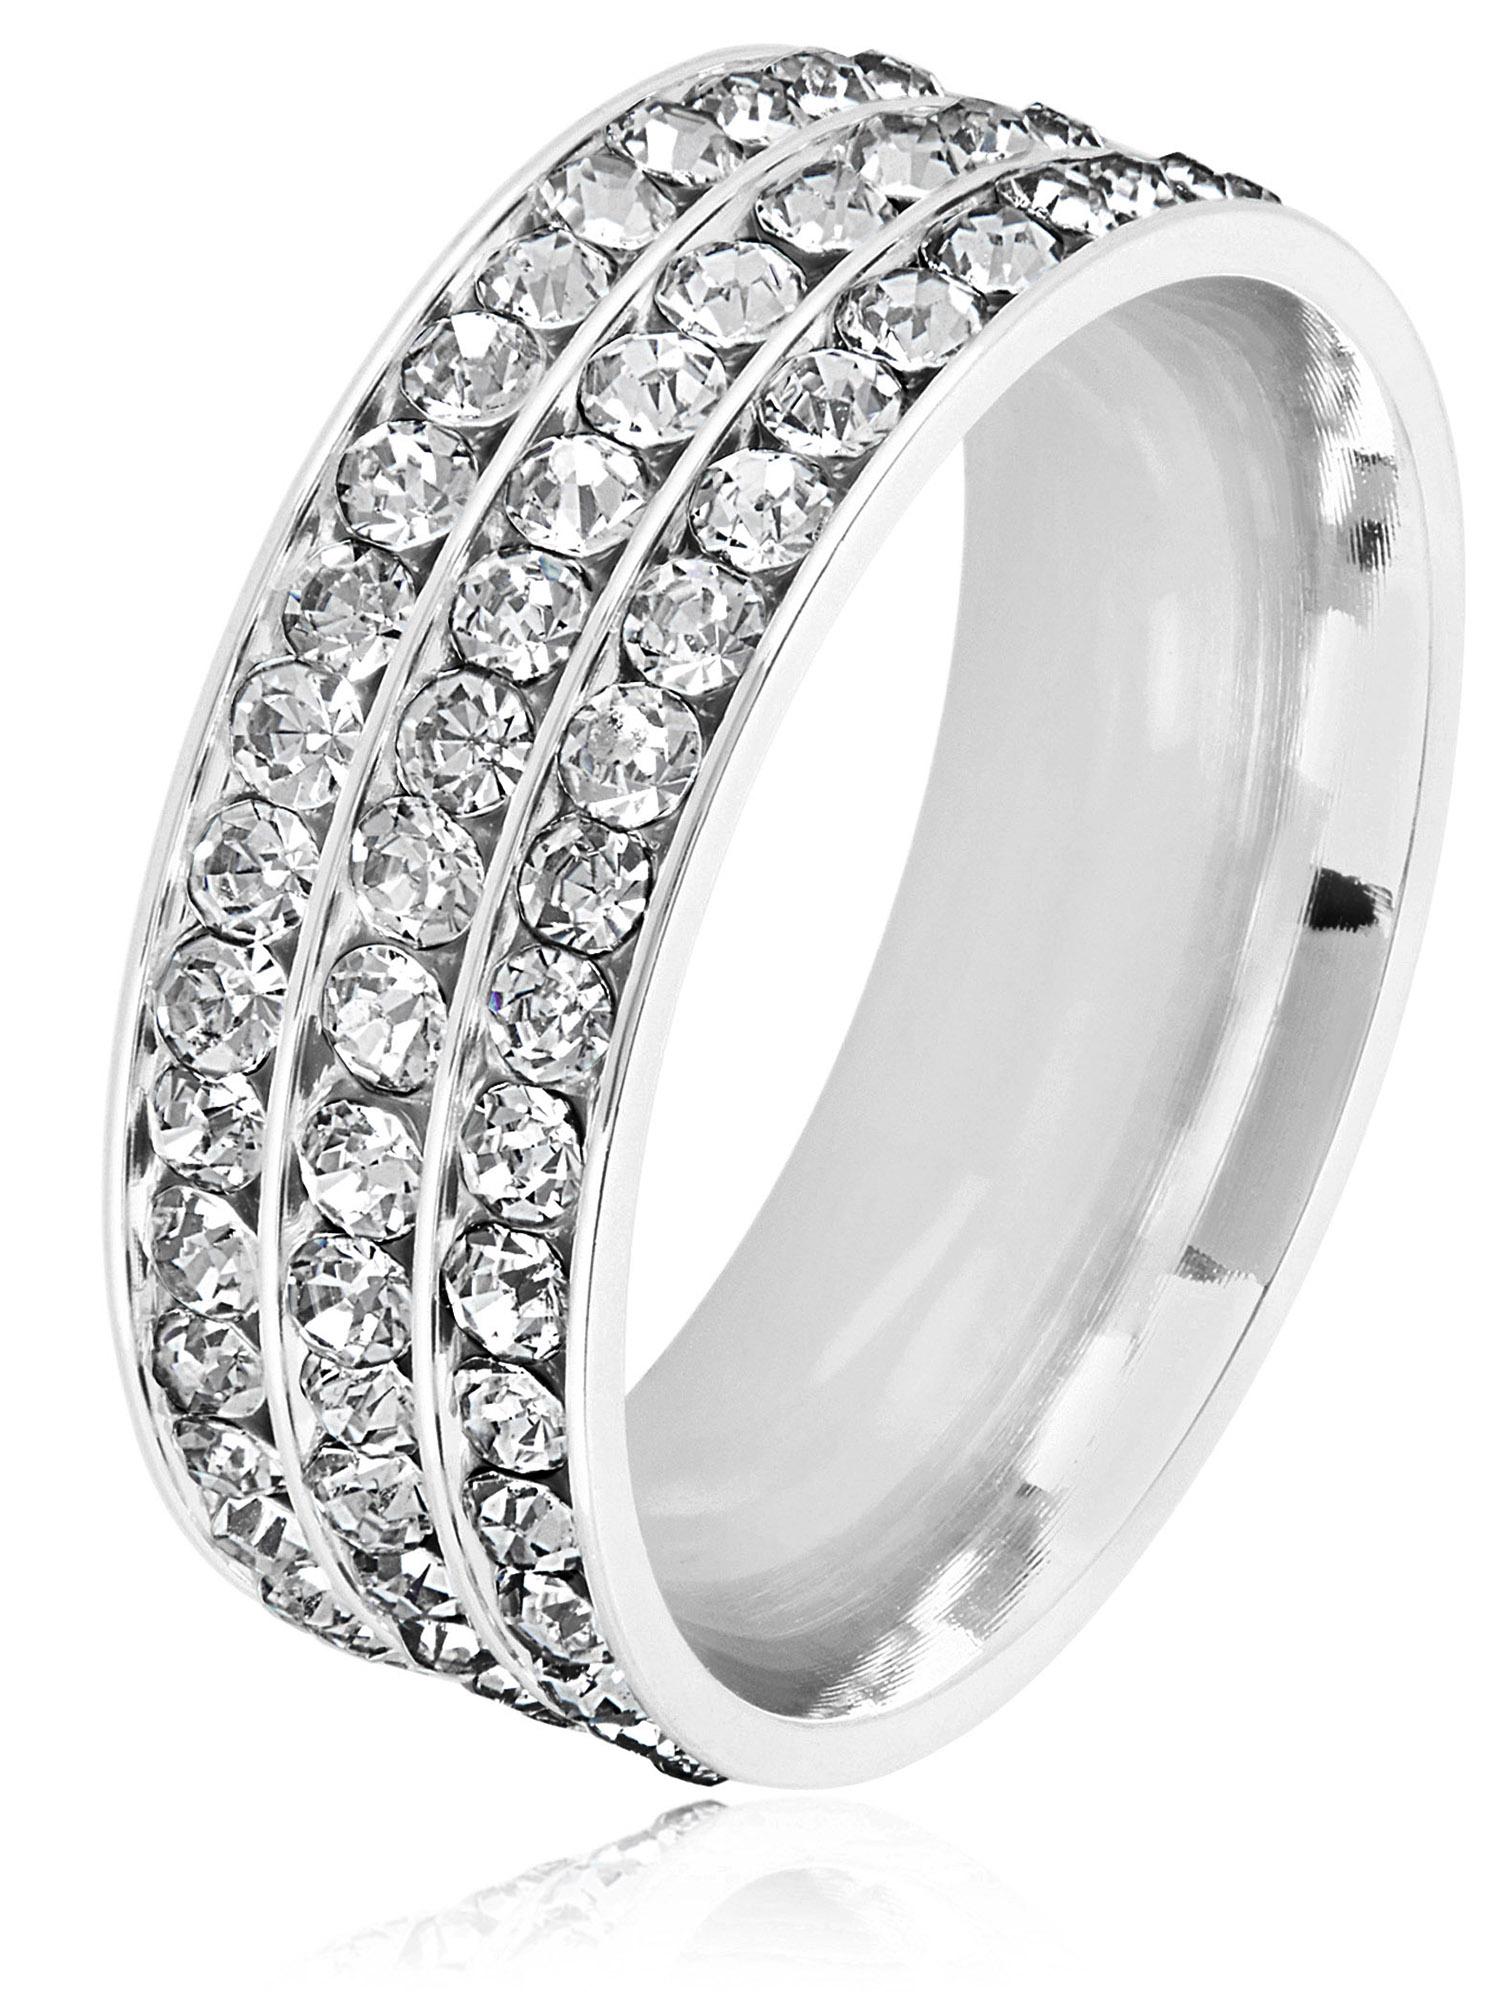 Triple Eternity Crystal Stainless Steel Comfort Fit Ring (8mm)